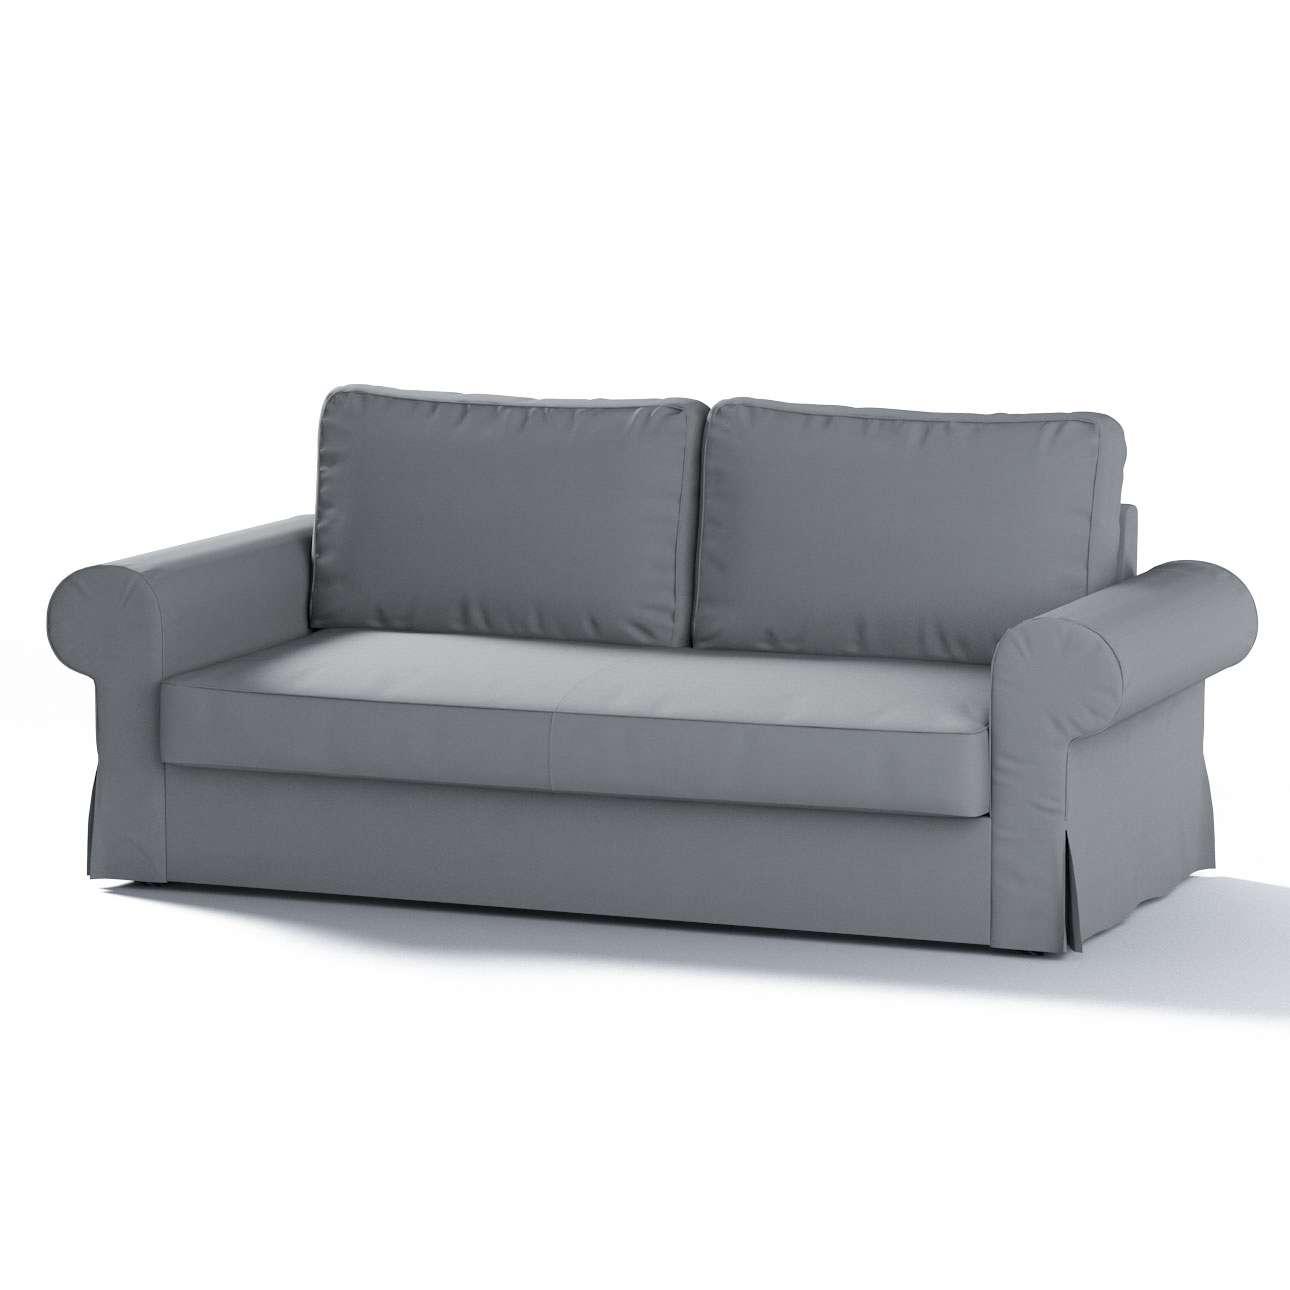 Cotton Panama, Slade grey